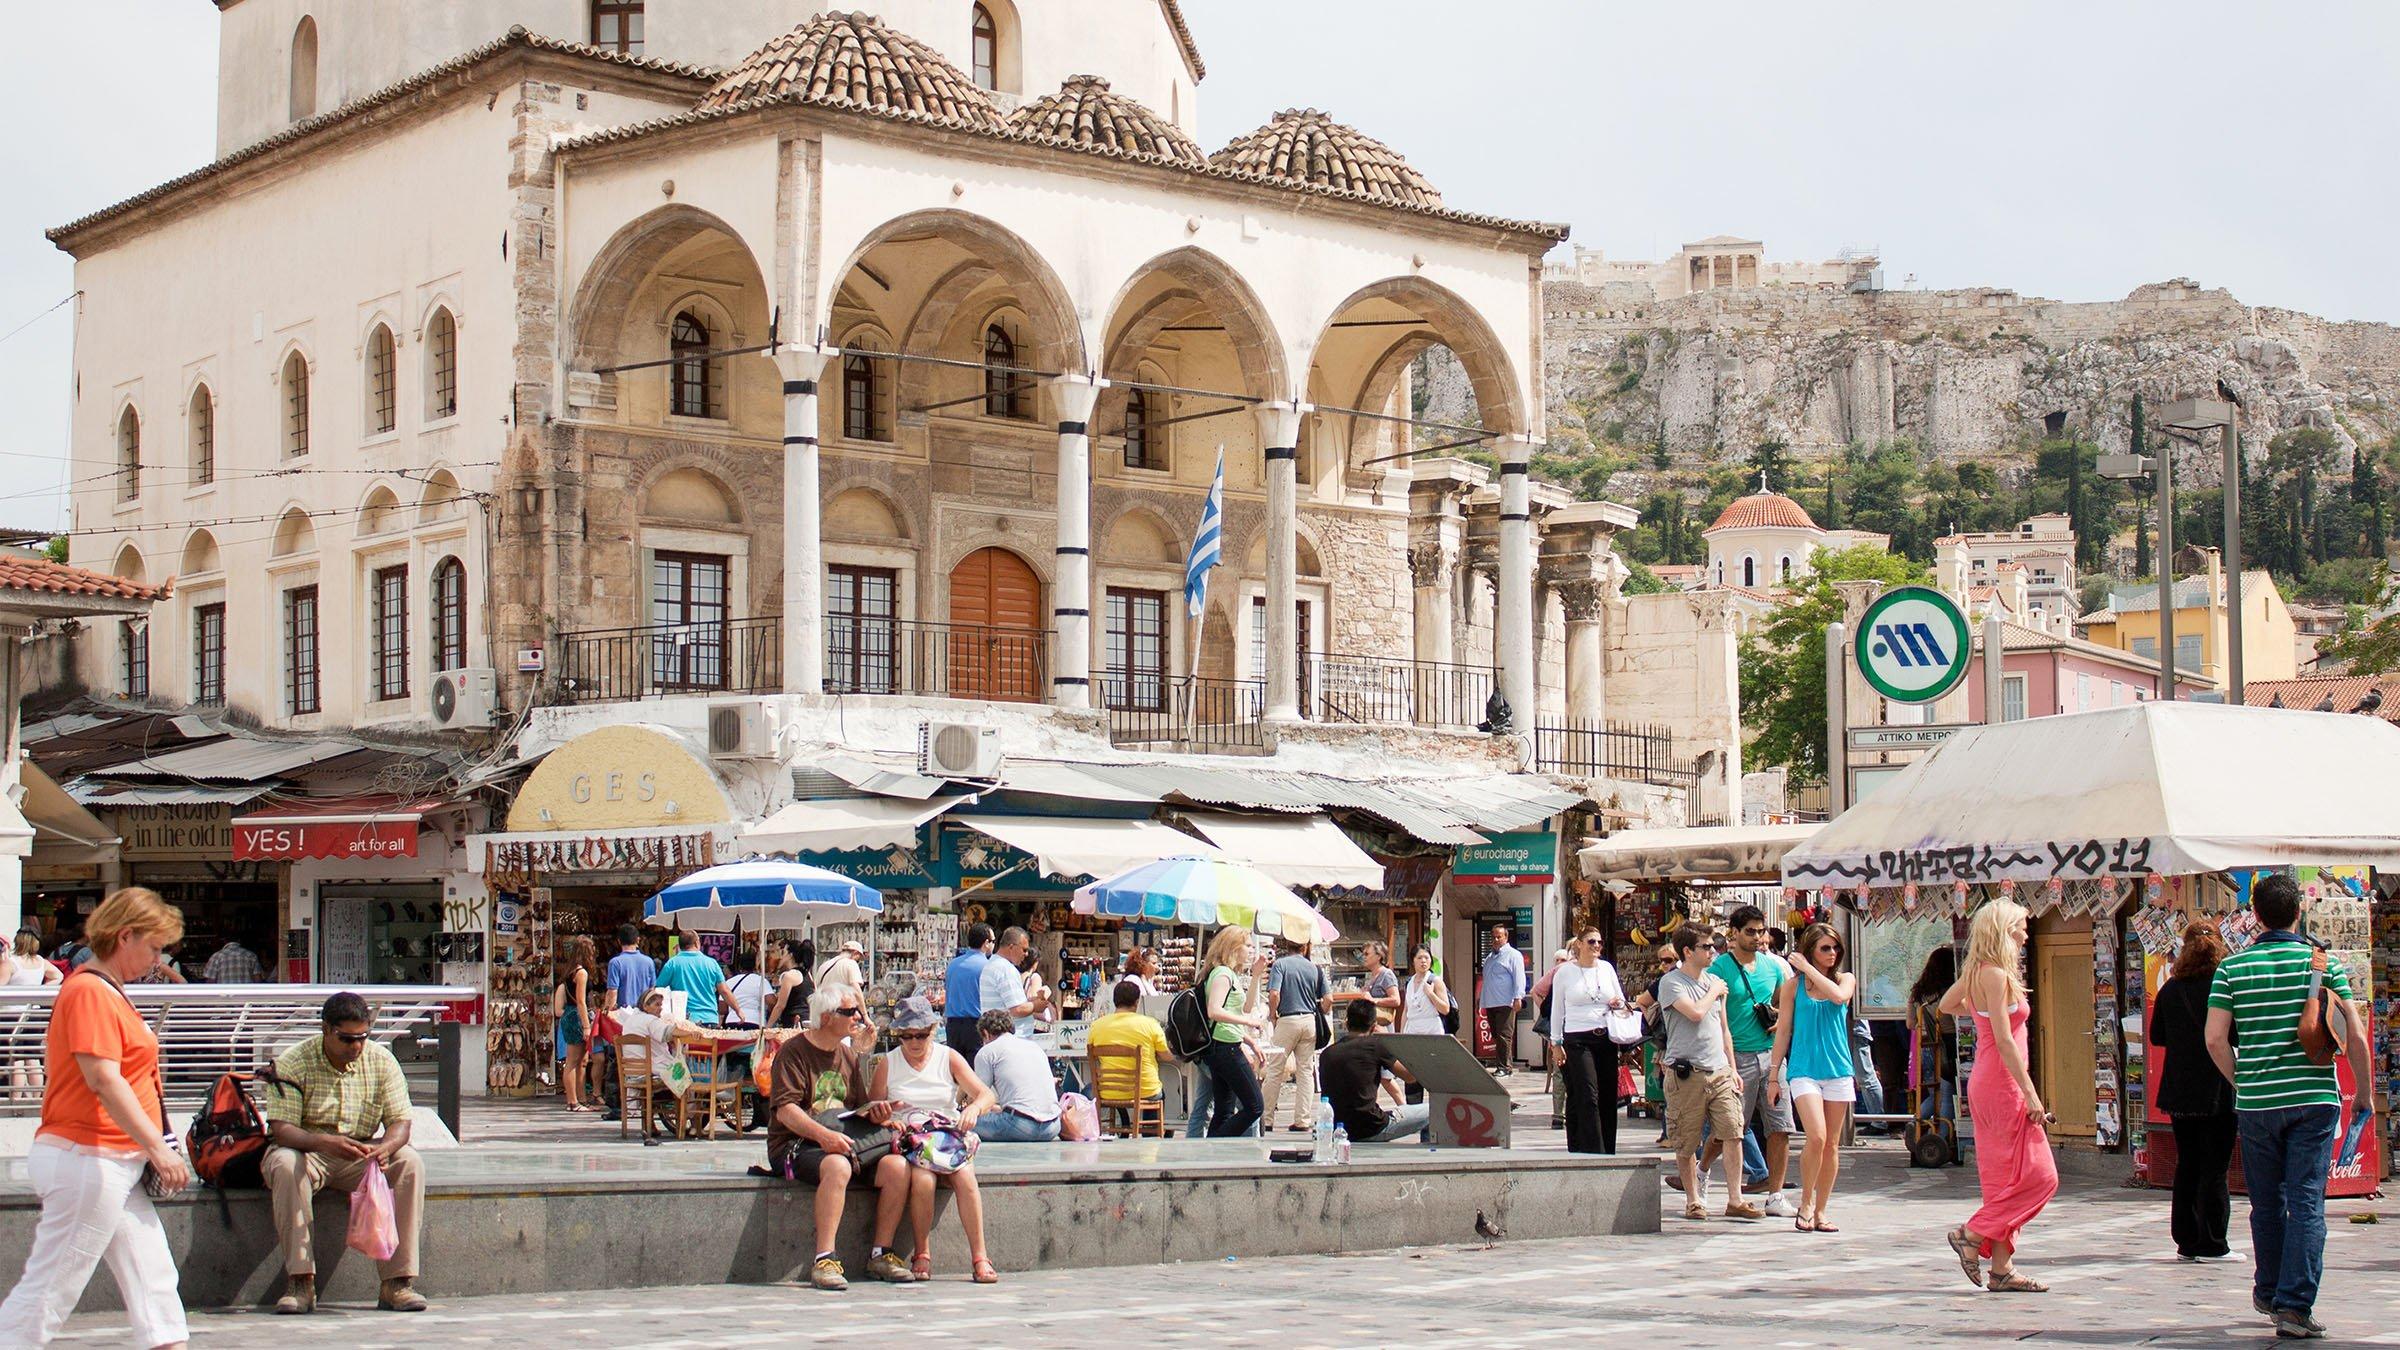 Costumbres grecia for Costumbres de grecia